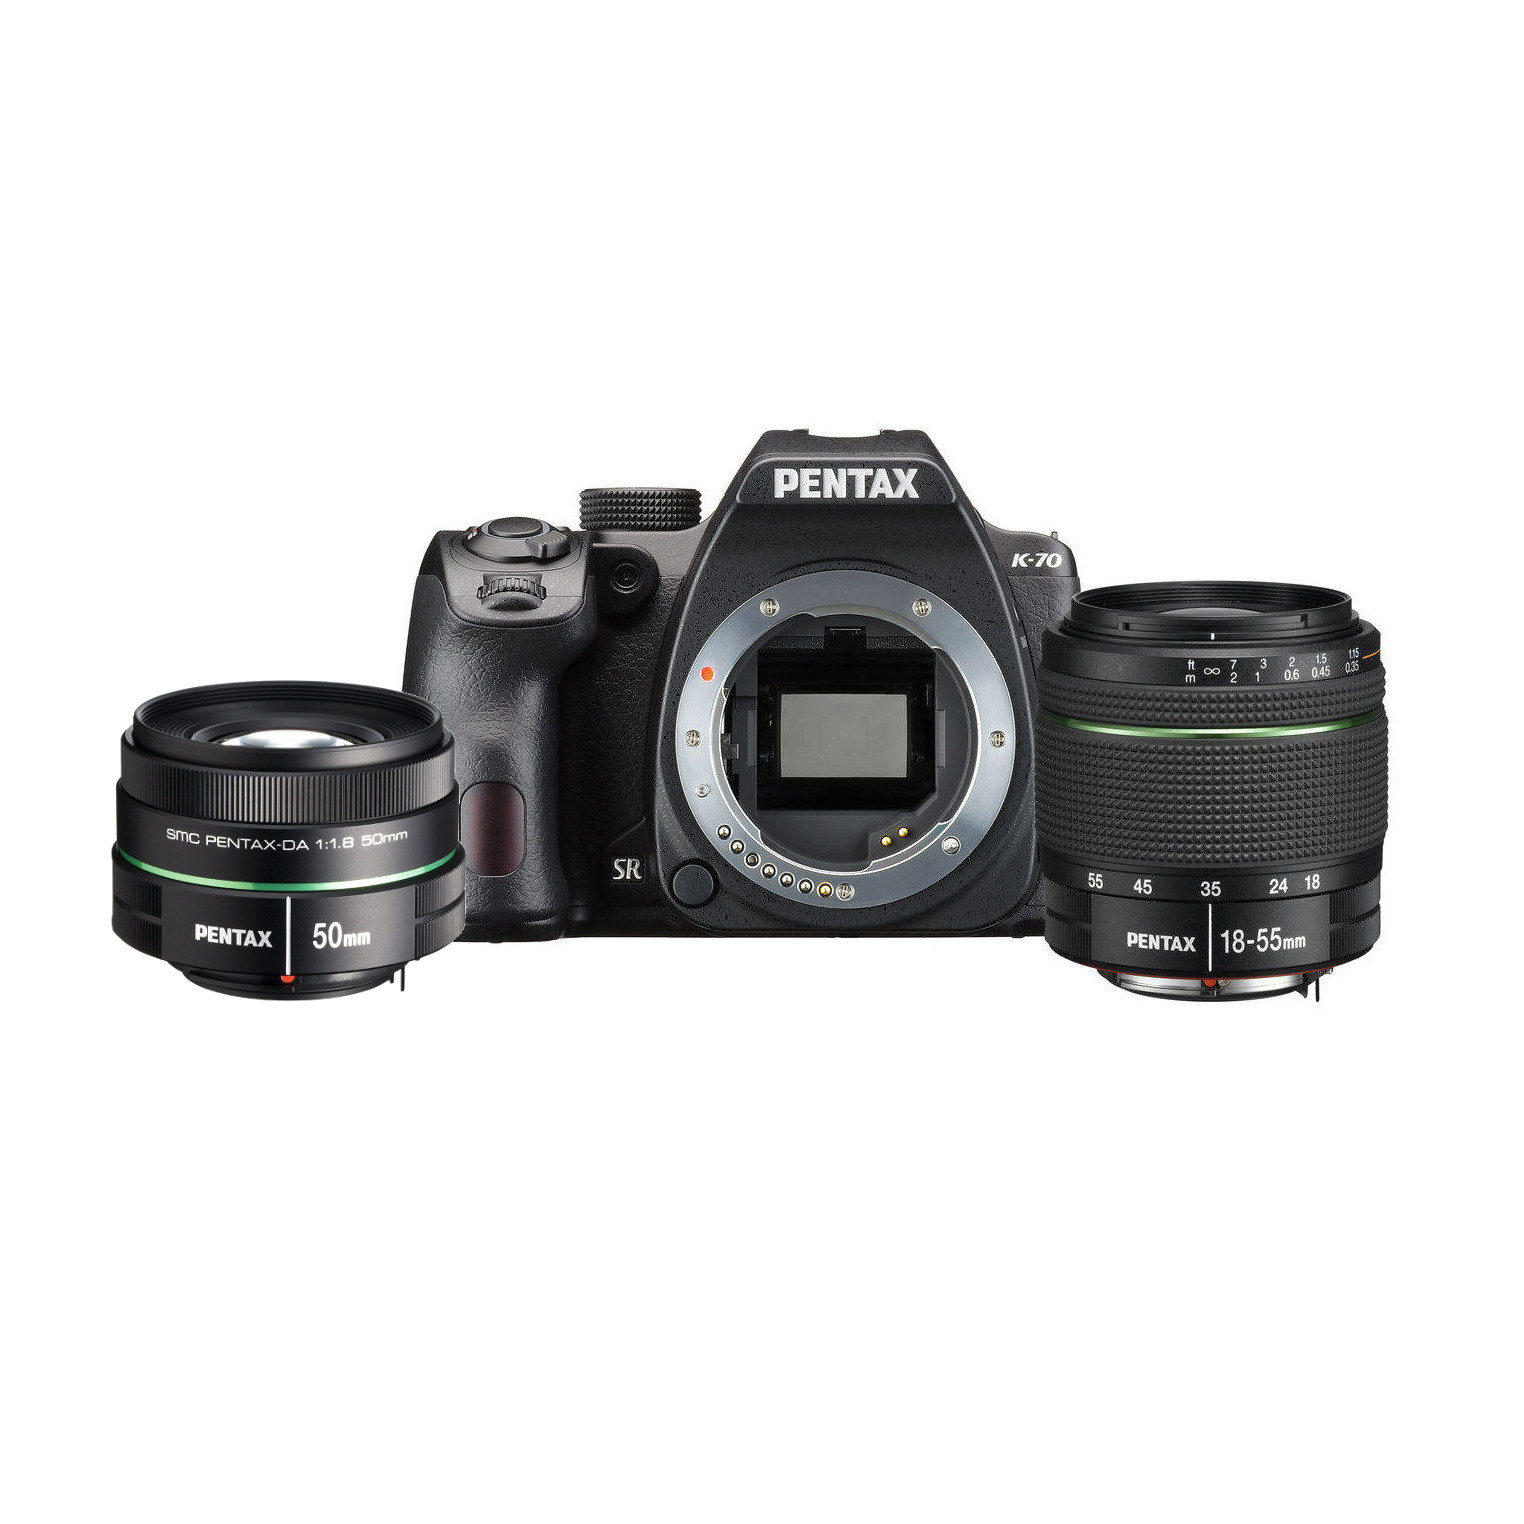 Pentax K-70 DSLR Zwart + 18-55mm + 50mm f/1.8 <br/>€ 999.00 <br/> <a href='https://www.cameranu.nl/fotografie/?tt=12190_474631_241358_&r=https%3A%2F%2Fwww.cameranu.nl%2Fnl%2Fp2853725%2Fpentax-k-70-dslr-zwart-18-55mm-50mm-f-1-8%3Fchannable%3De10841.Mjg1MzcyNQ%26utm_campaign%3D%26utm_content%3DSpiegelreflex%2Bcamera%26utm_source%3DTradetracker%26utm_medium%3Dcpc%26utm_term%3DDigitale%2Bcamera%26apos%3Bs' target='_blank'>naar de winkel</a>